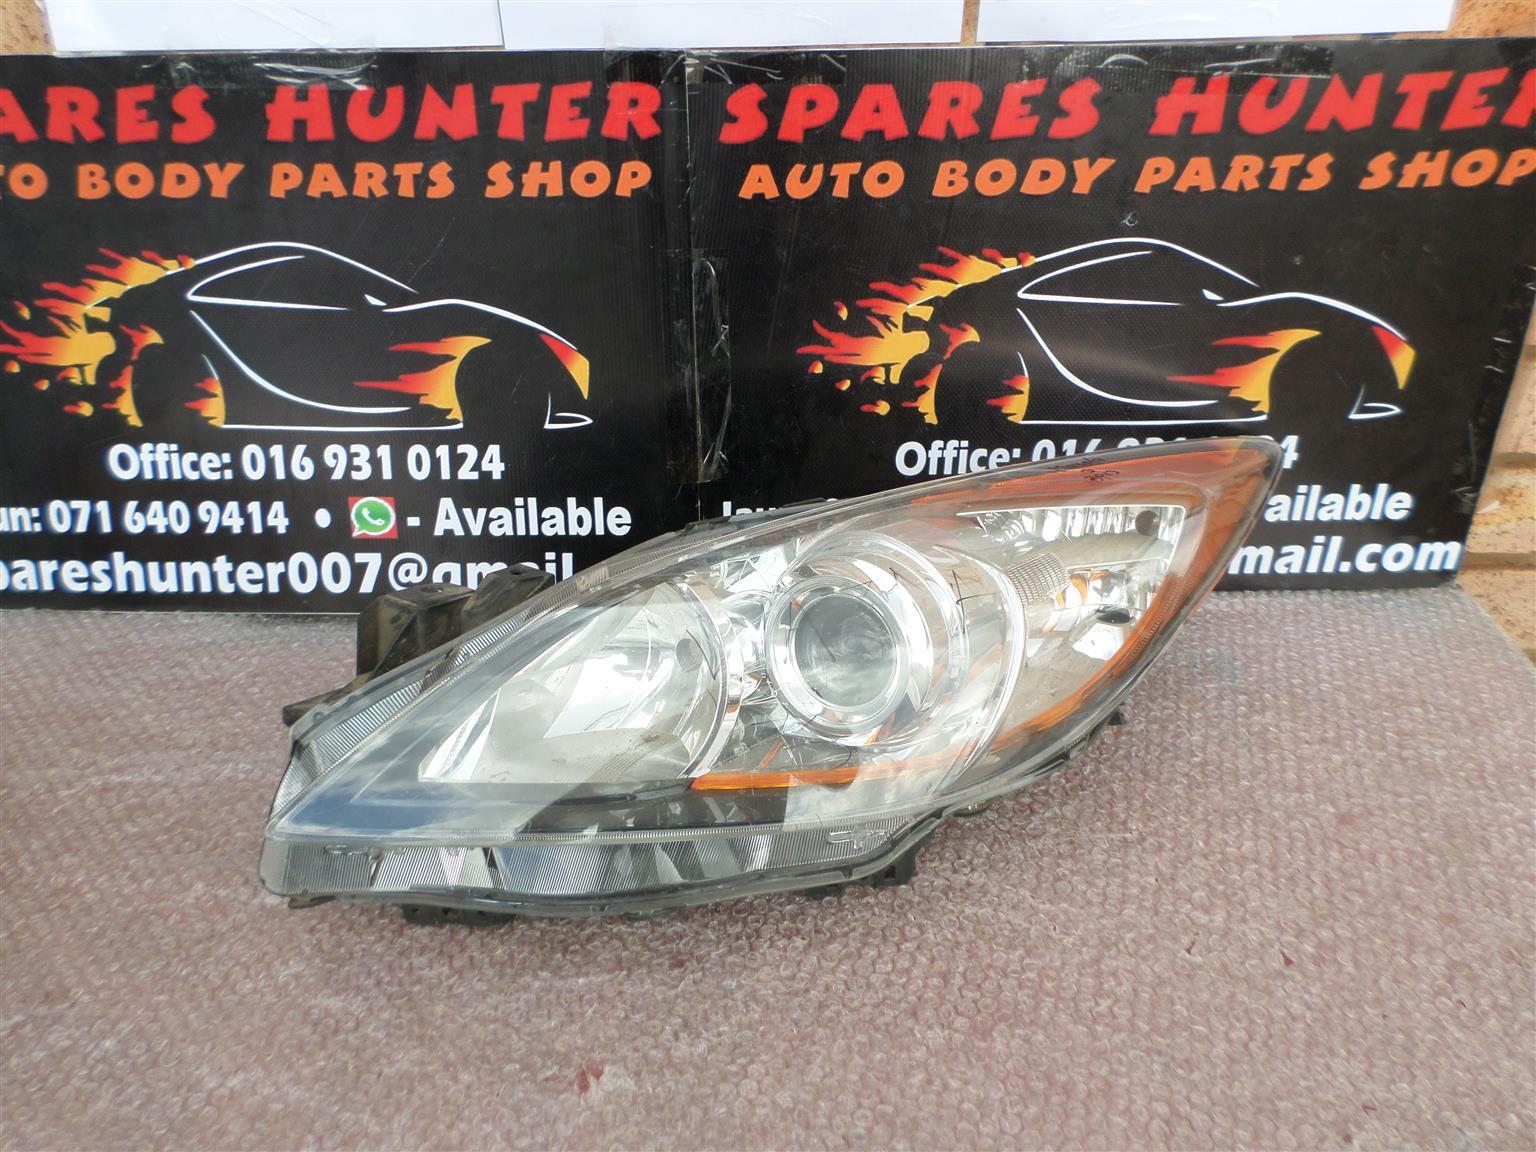 Mazda 3 Headlight for sale